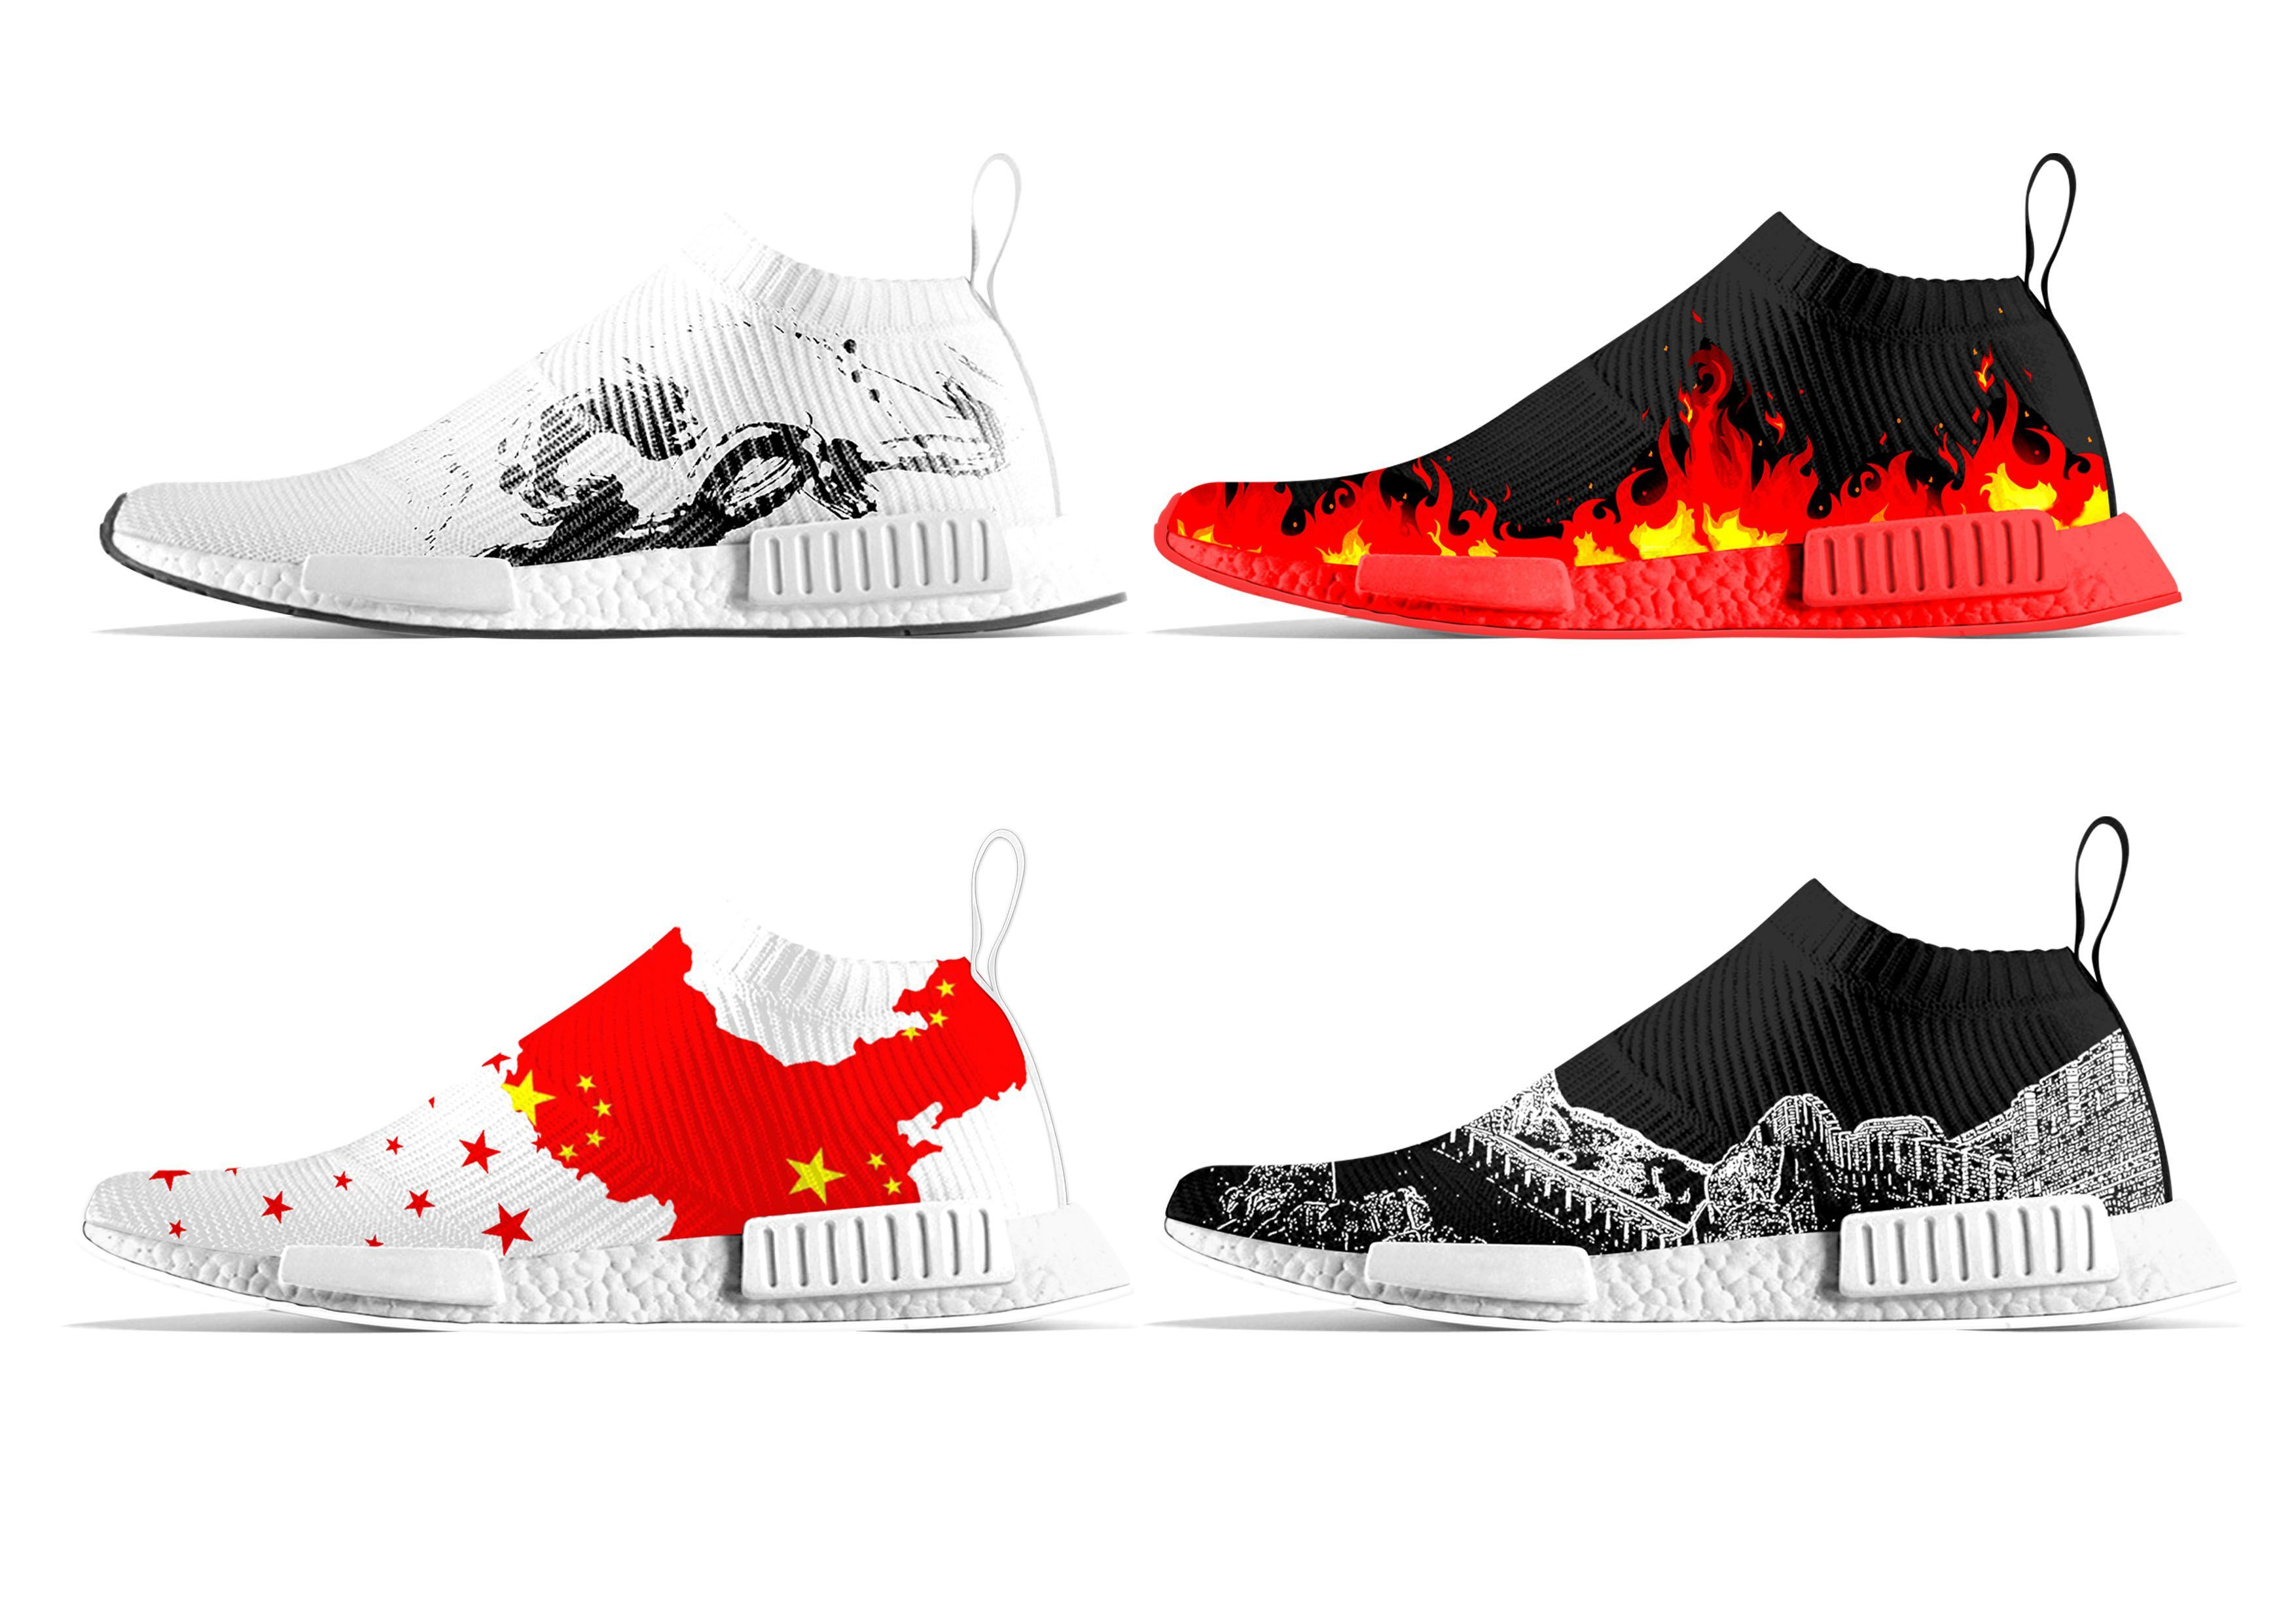 Custom Nmd Sock Primeknit Running Shoes